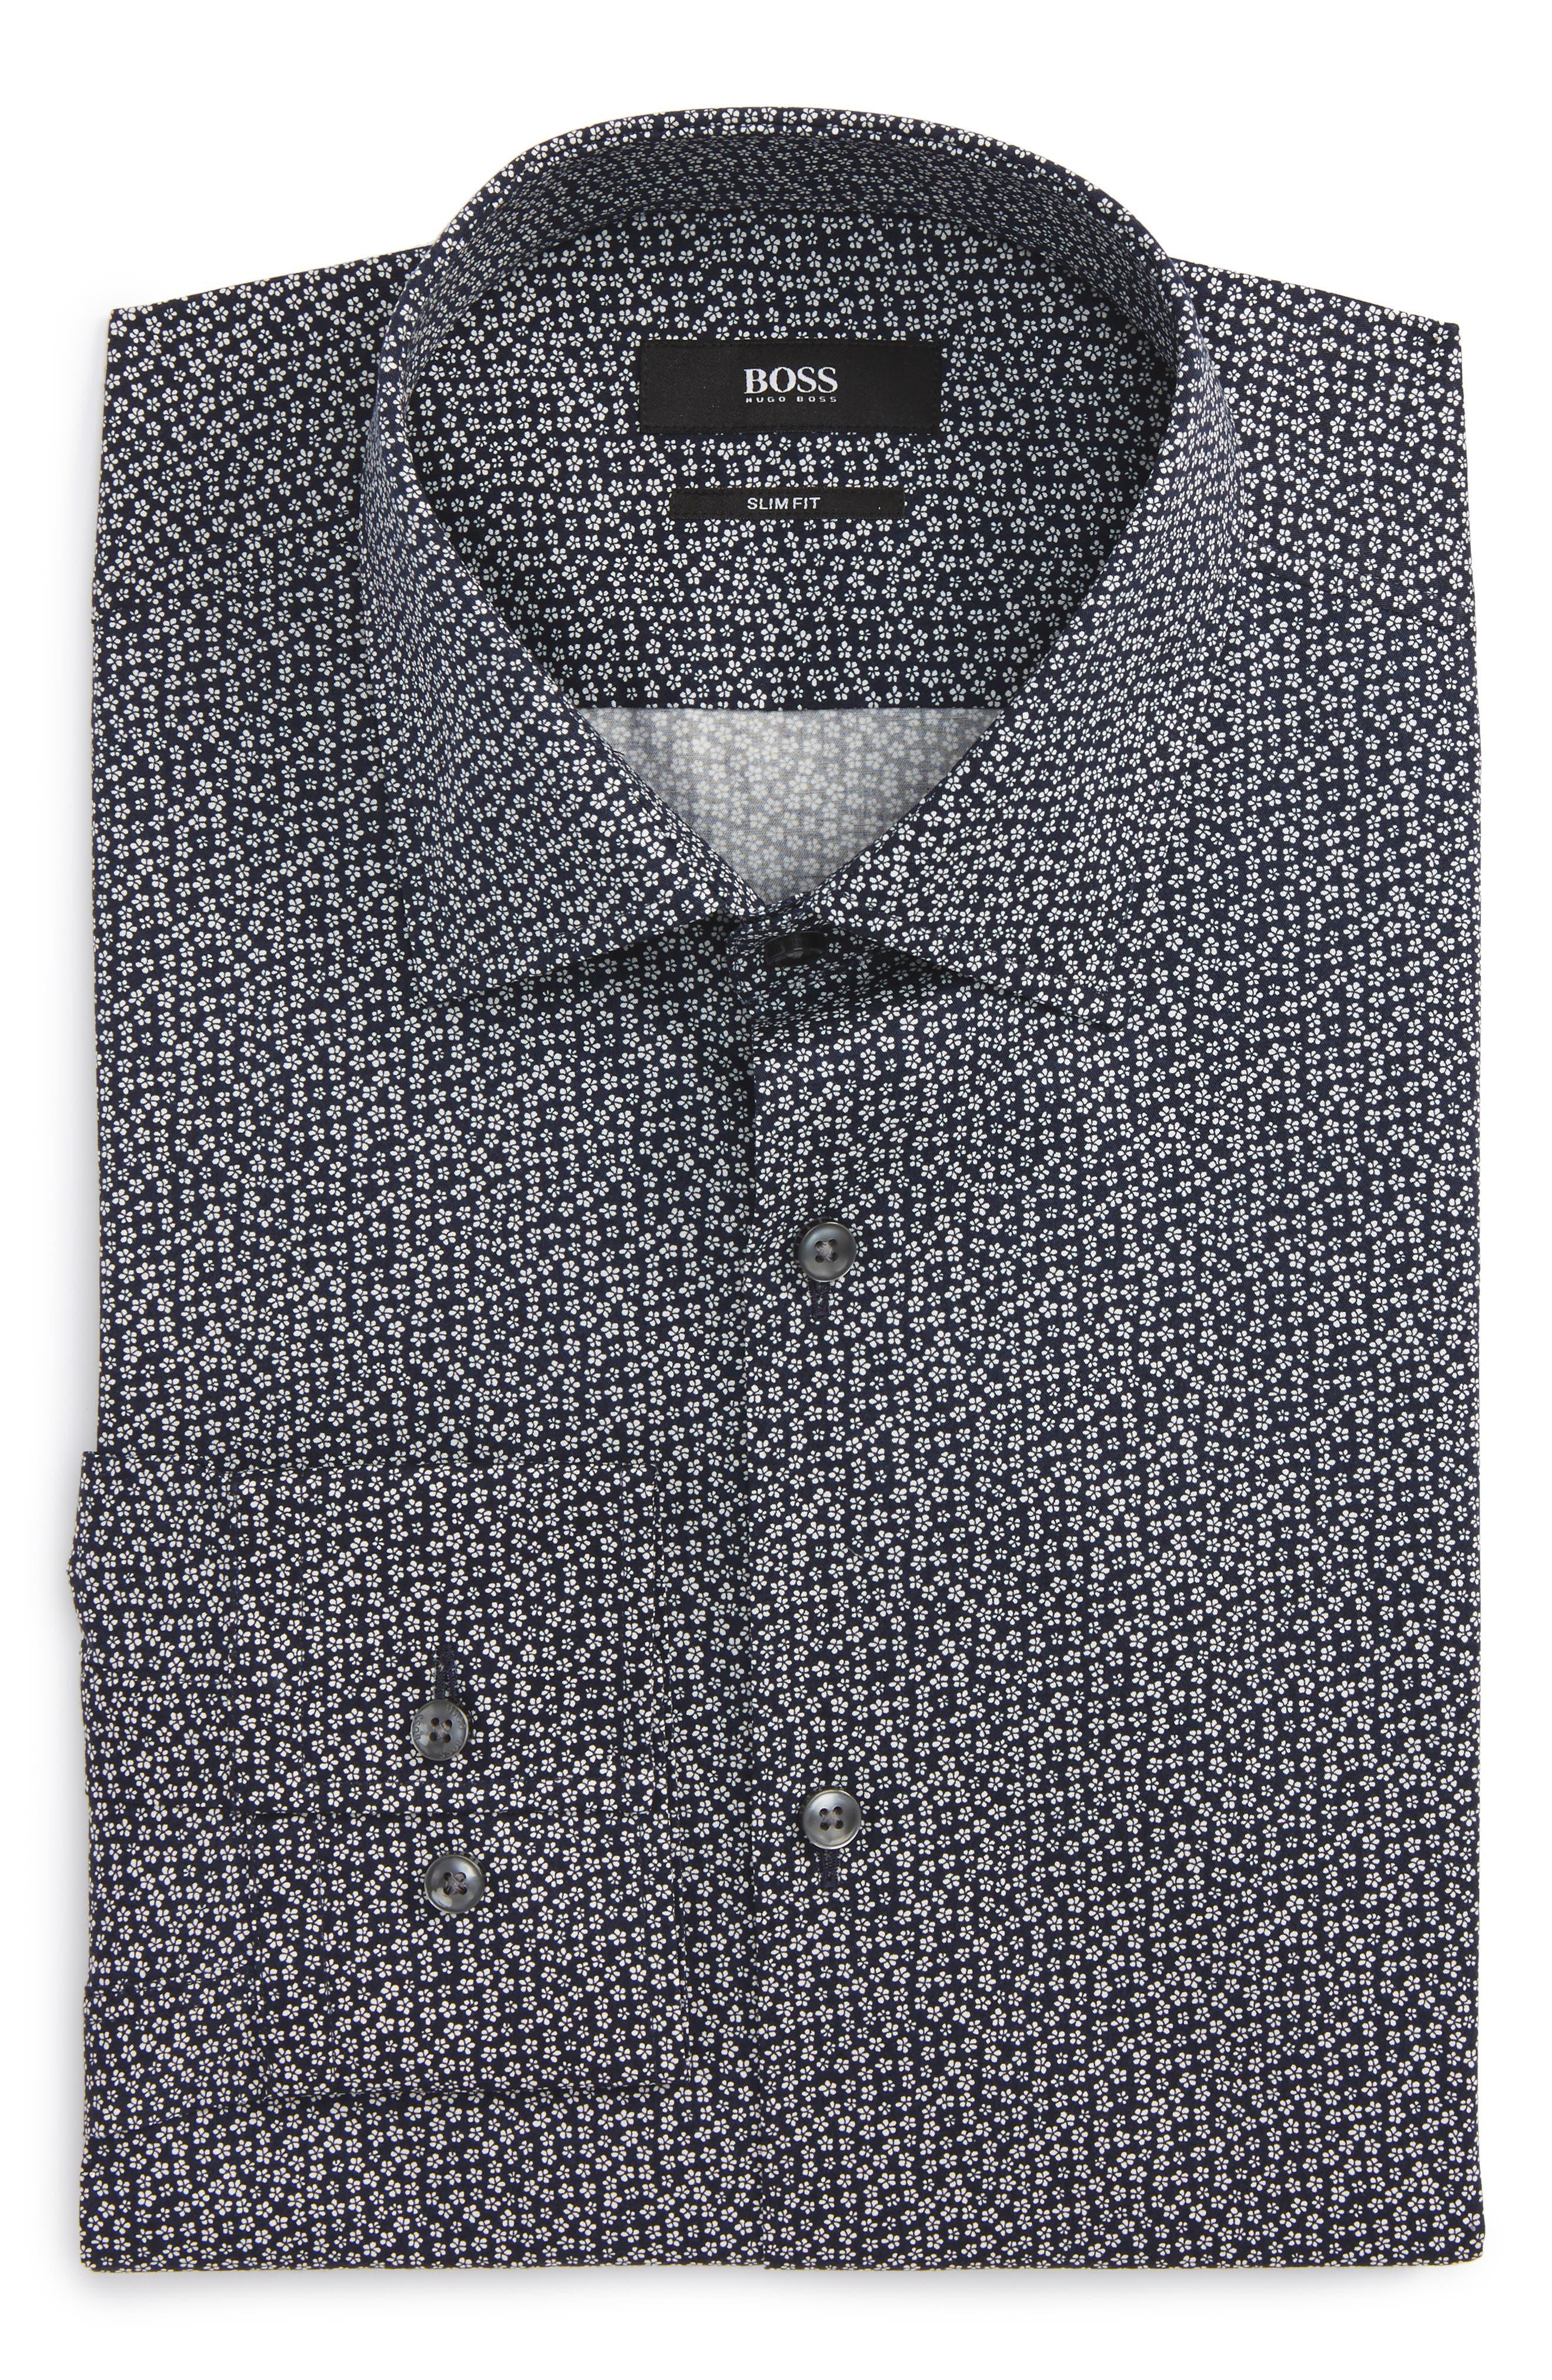 Main Image - BOSS Slim Fit Floral Dress Shirt